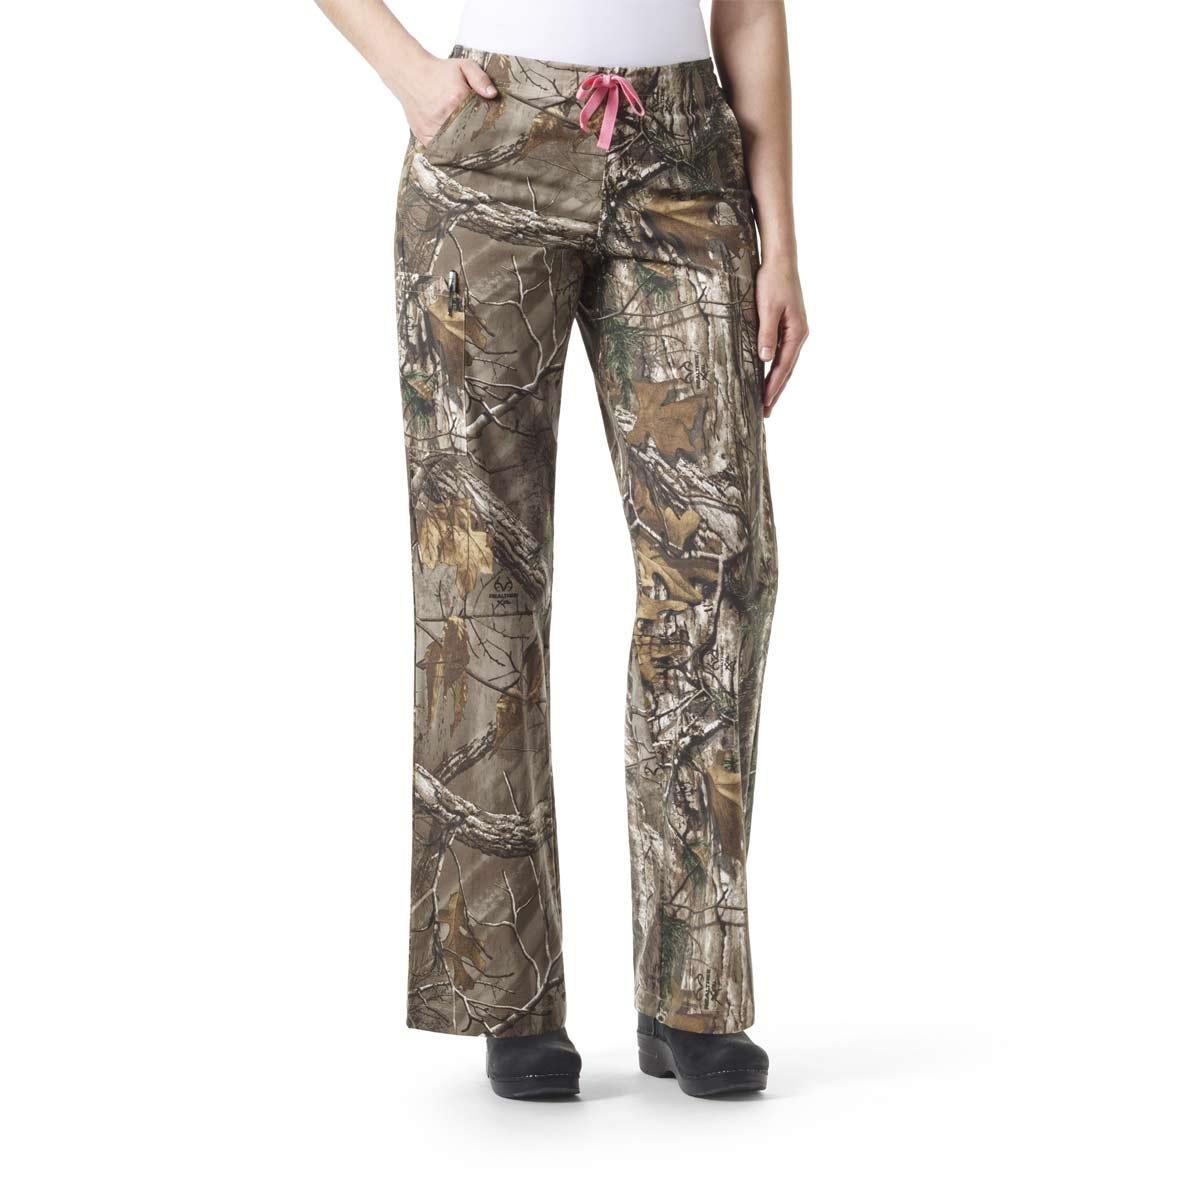 49e64d190de Camo Scrub Pants For Women Carhartt Realtree Utility Boot Cut